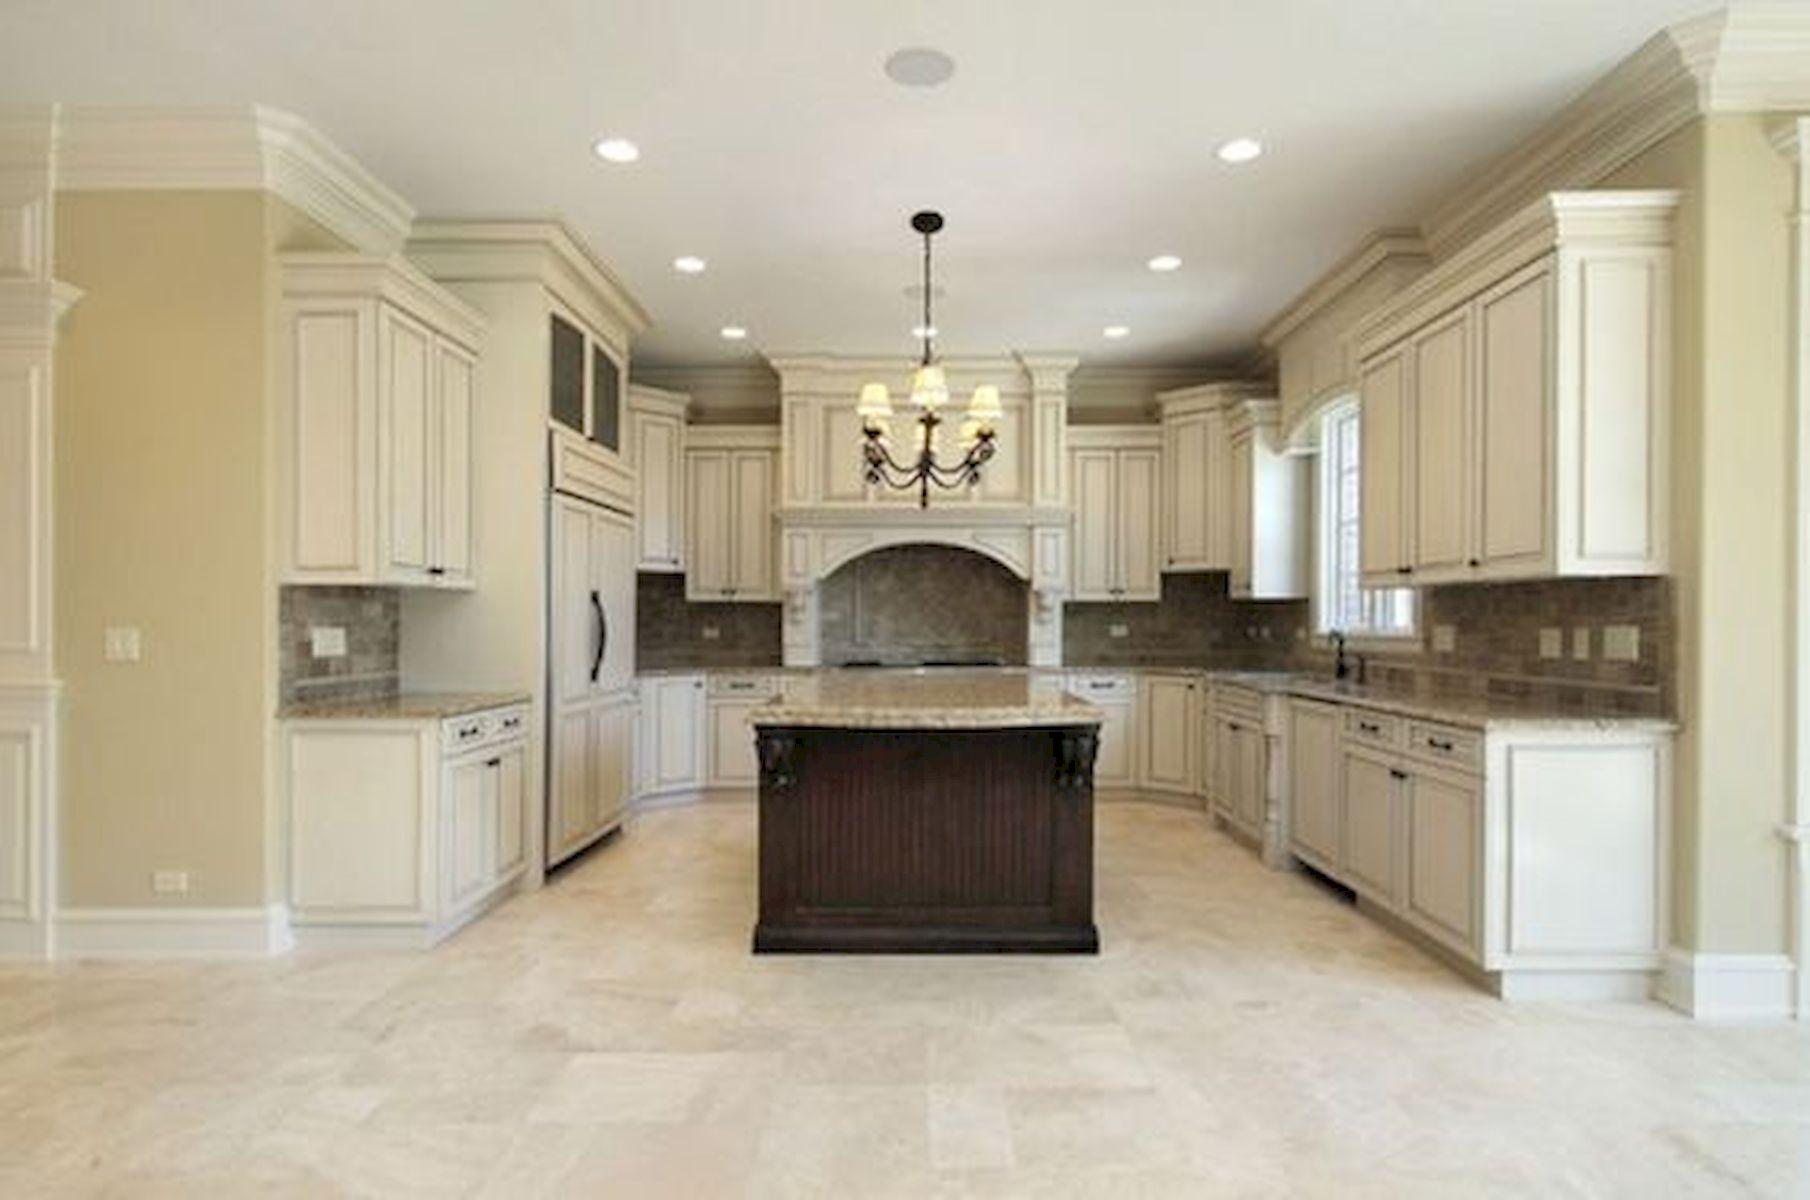 30 Best Kitchen Floor Tile Design Ideas With Concrete Floor Ideas (7)